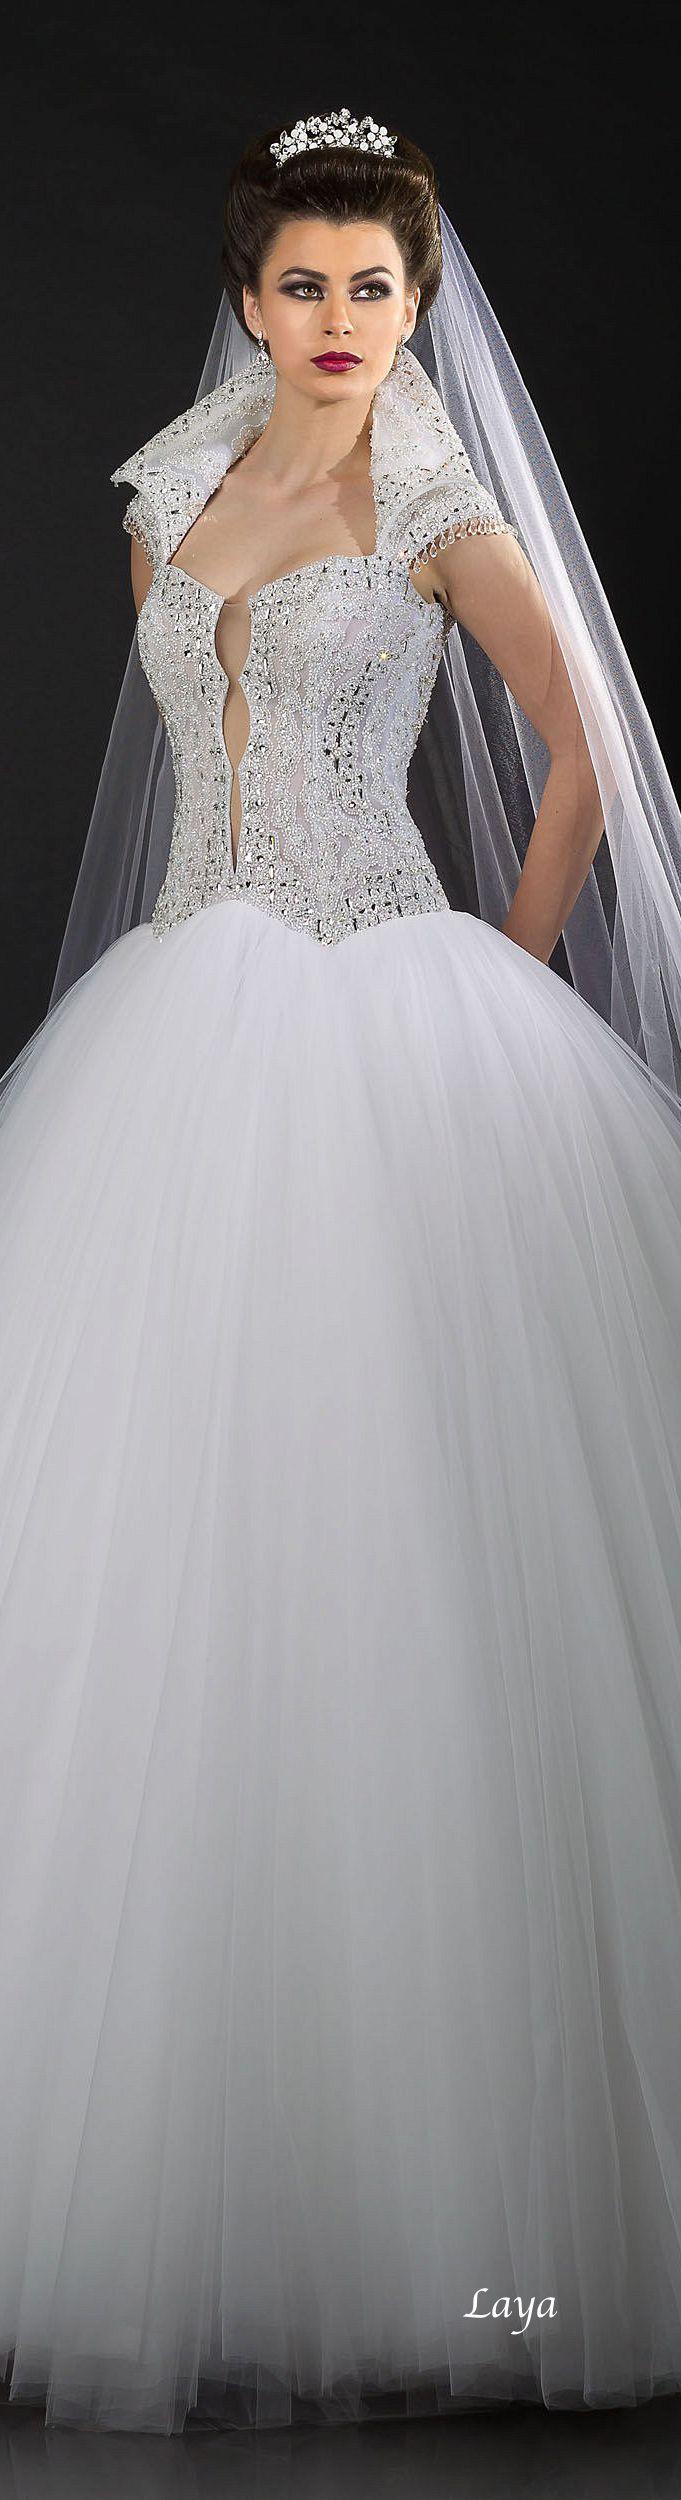 402 best fairytale wedding dresses images on Pinterest | Princess ...